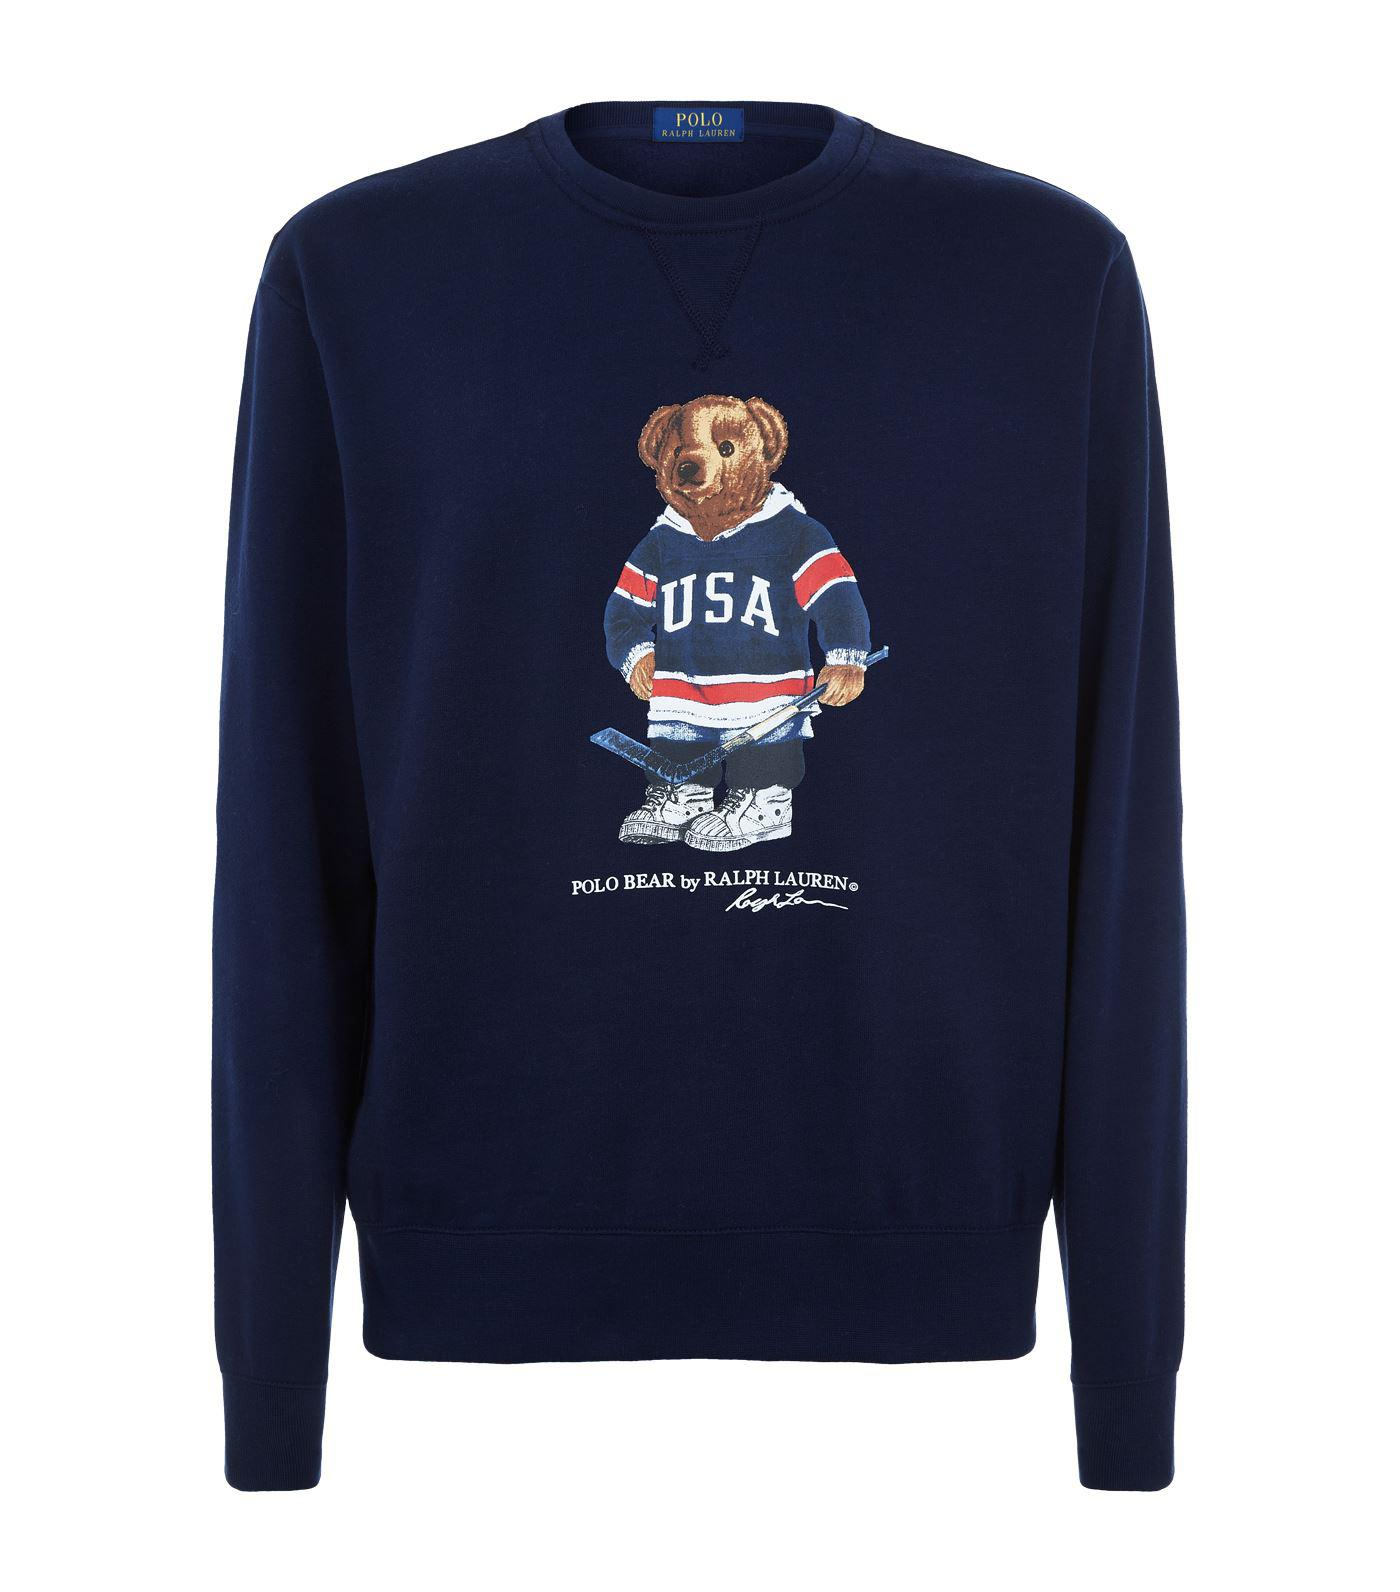 bdbcddd7 Polo Ralph Lauren Hockey Polo Bear Printed Sweatshirt in Blue for ...